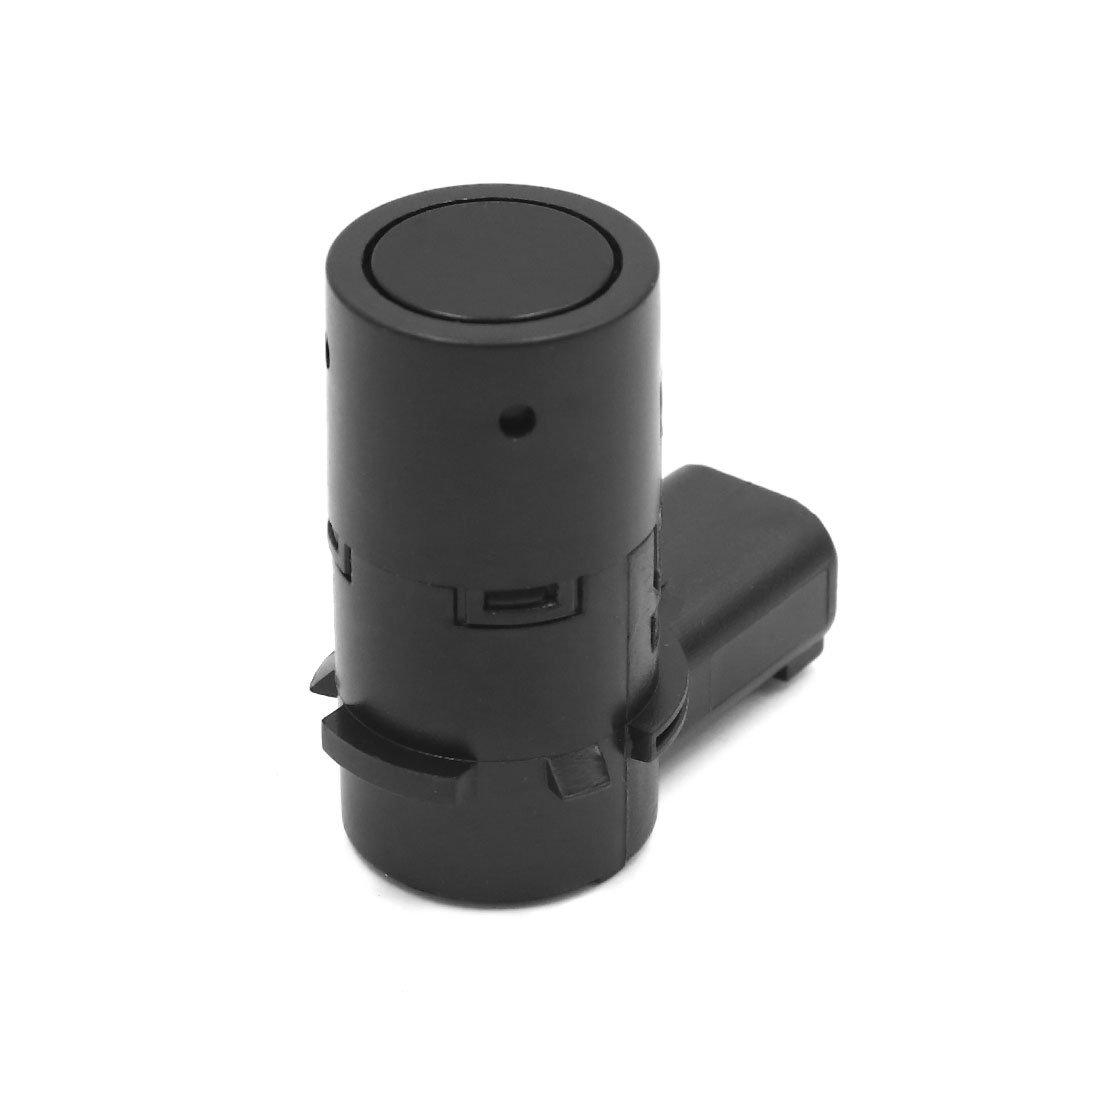 uxcell YDB500311LML Bumper Parking Distance Assist Sensor for 2005-2009 Land Rover LR3